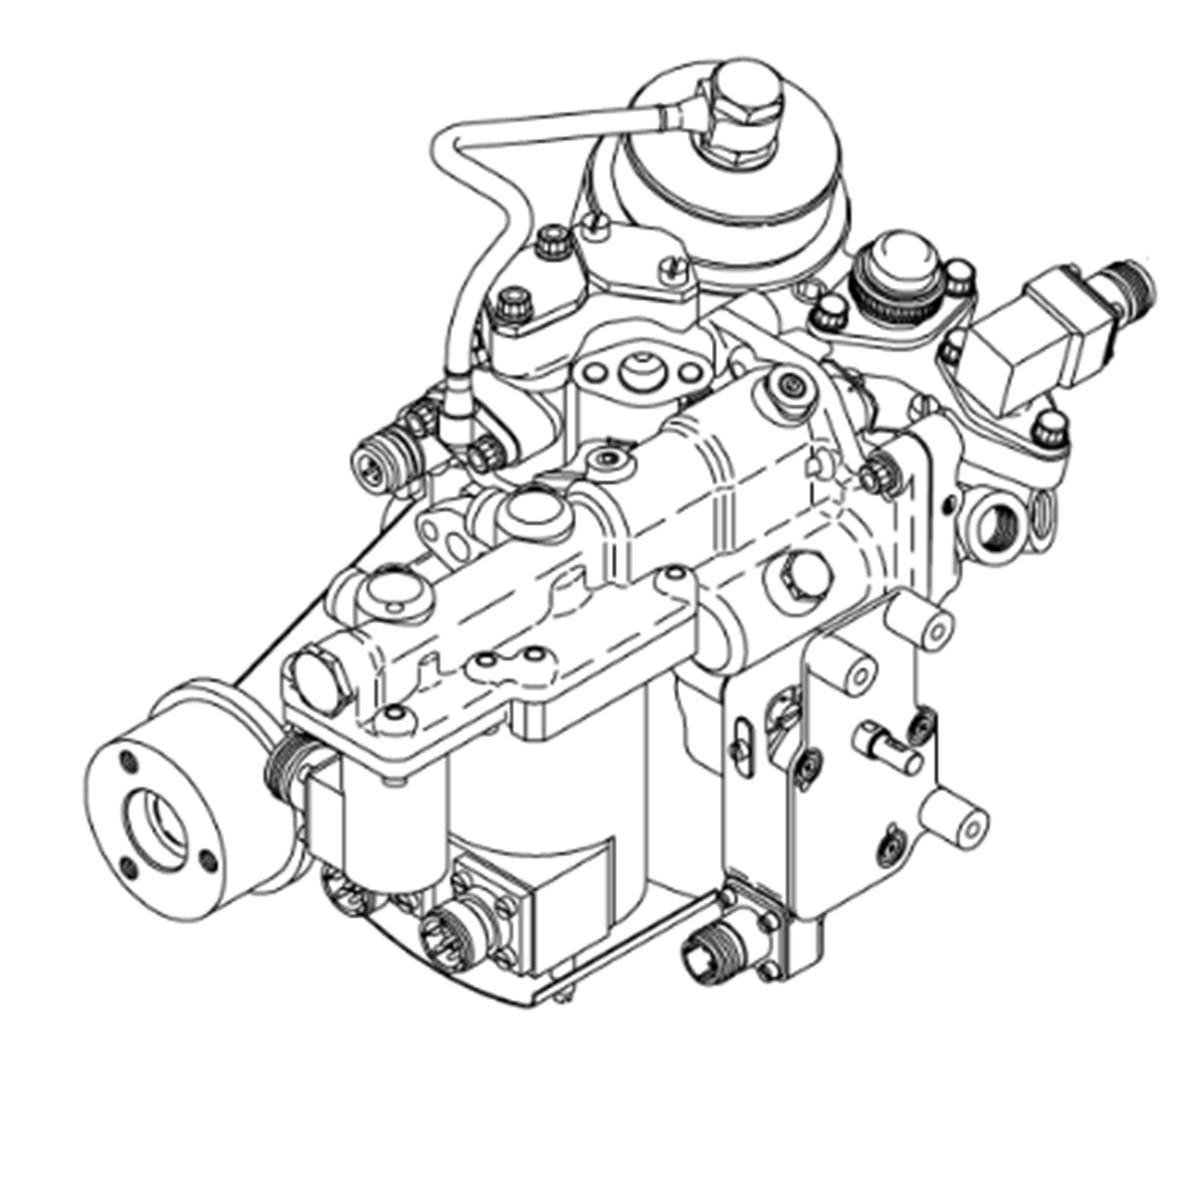 Pump And Metering Valve Assy Adjusted Pn